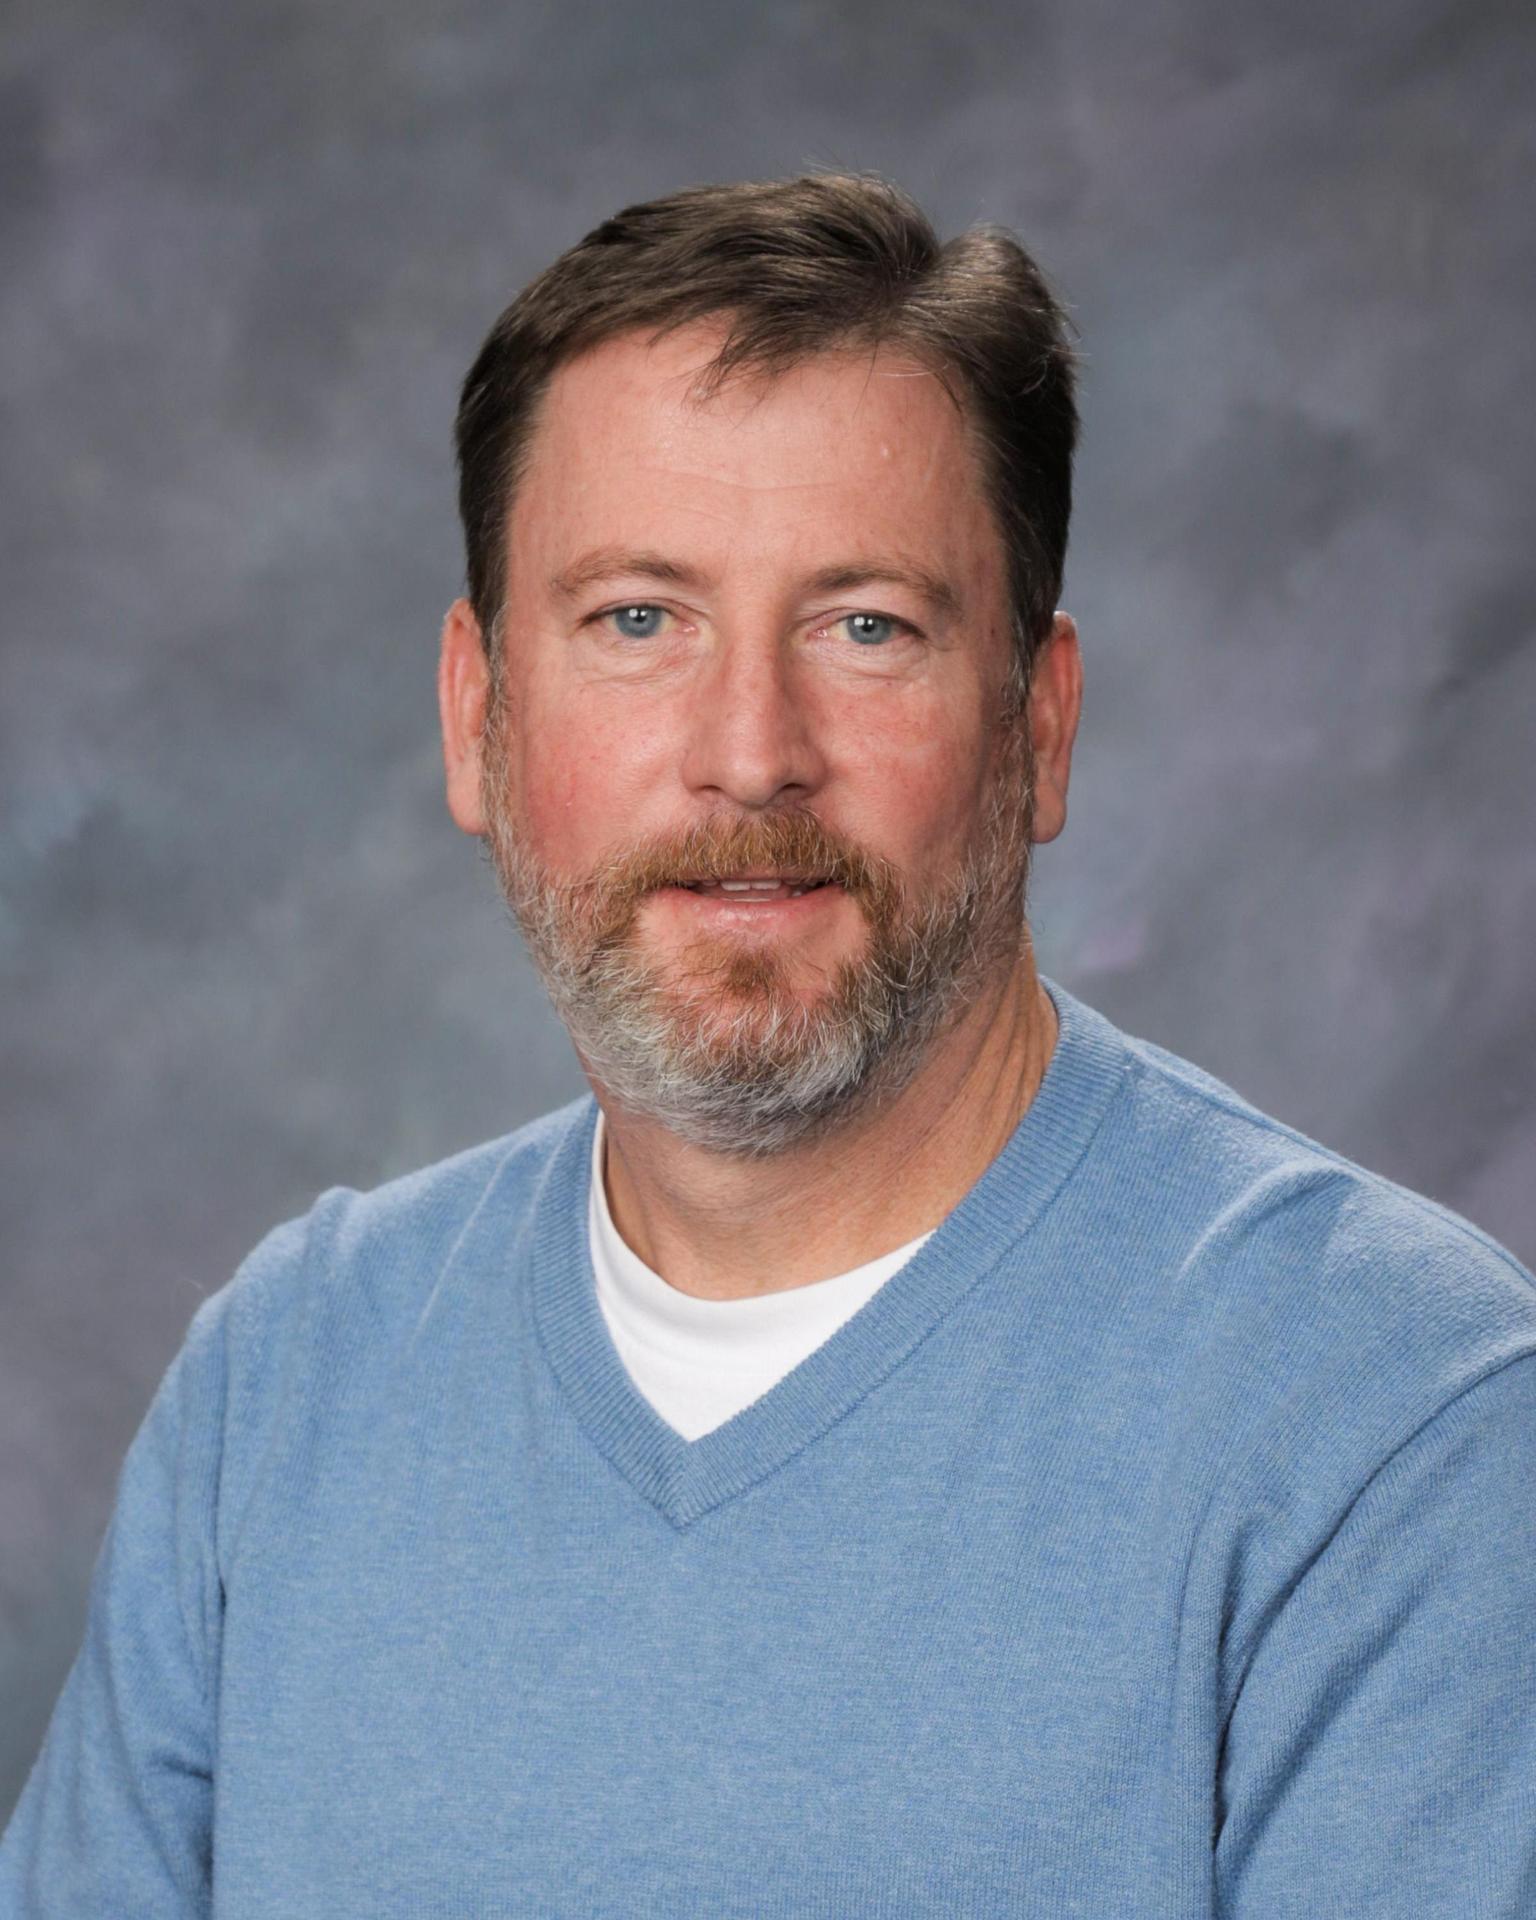 Russ Tuman, Director of Innovation